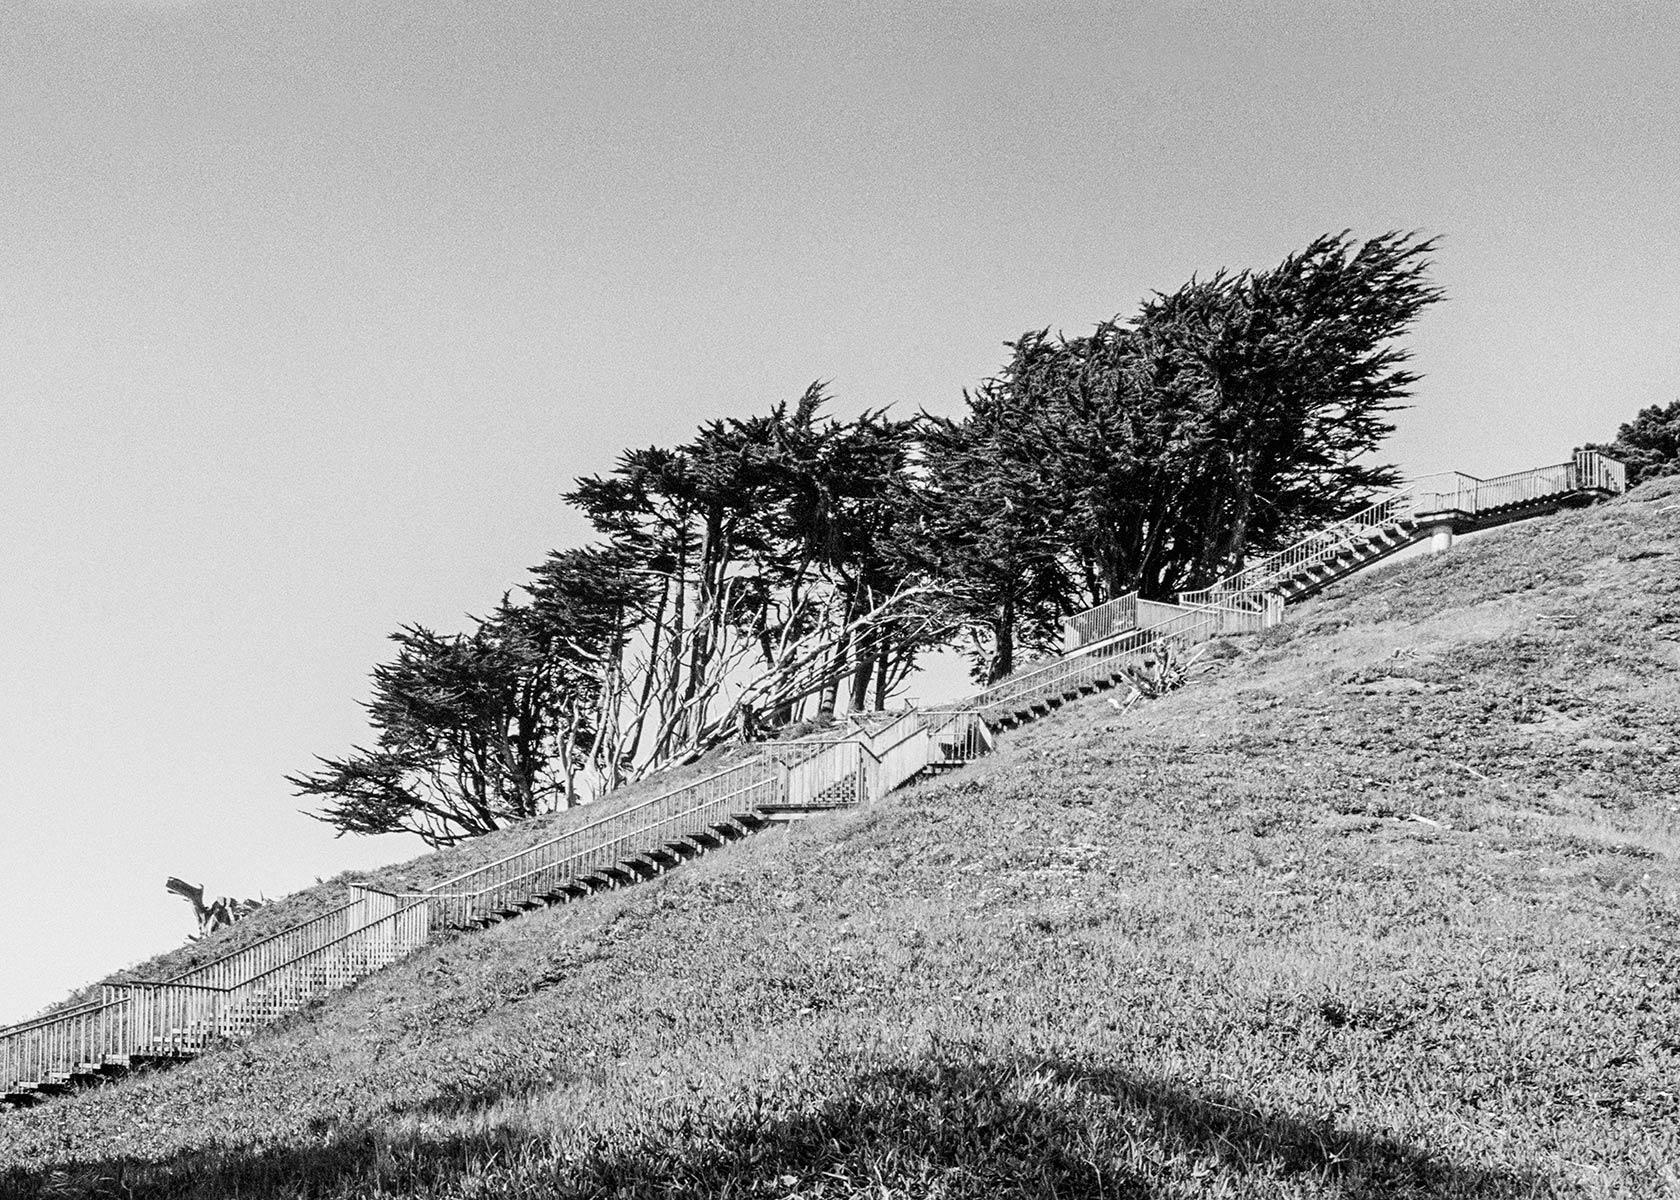 Golden Gate Heights, Study 3